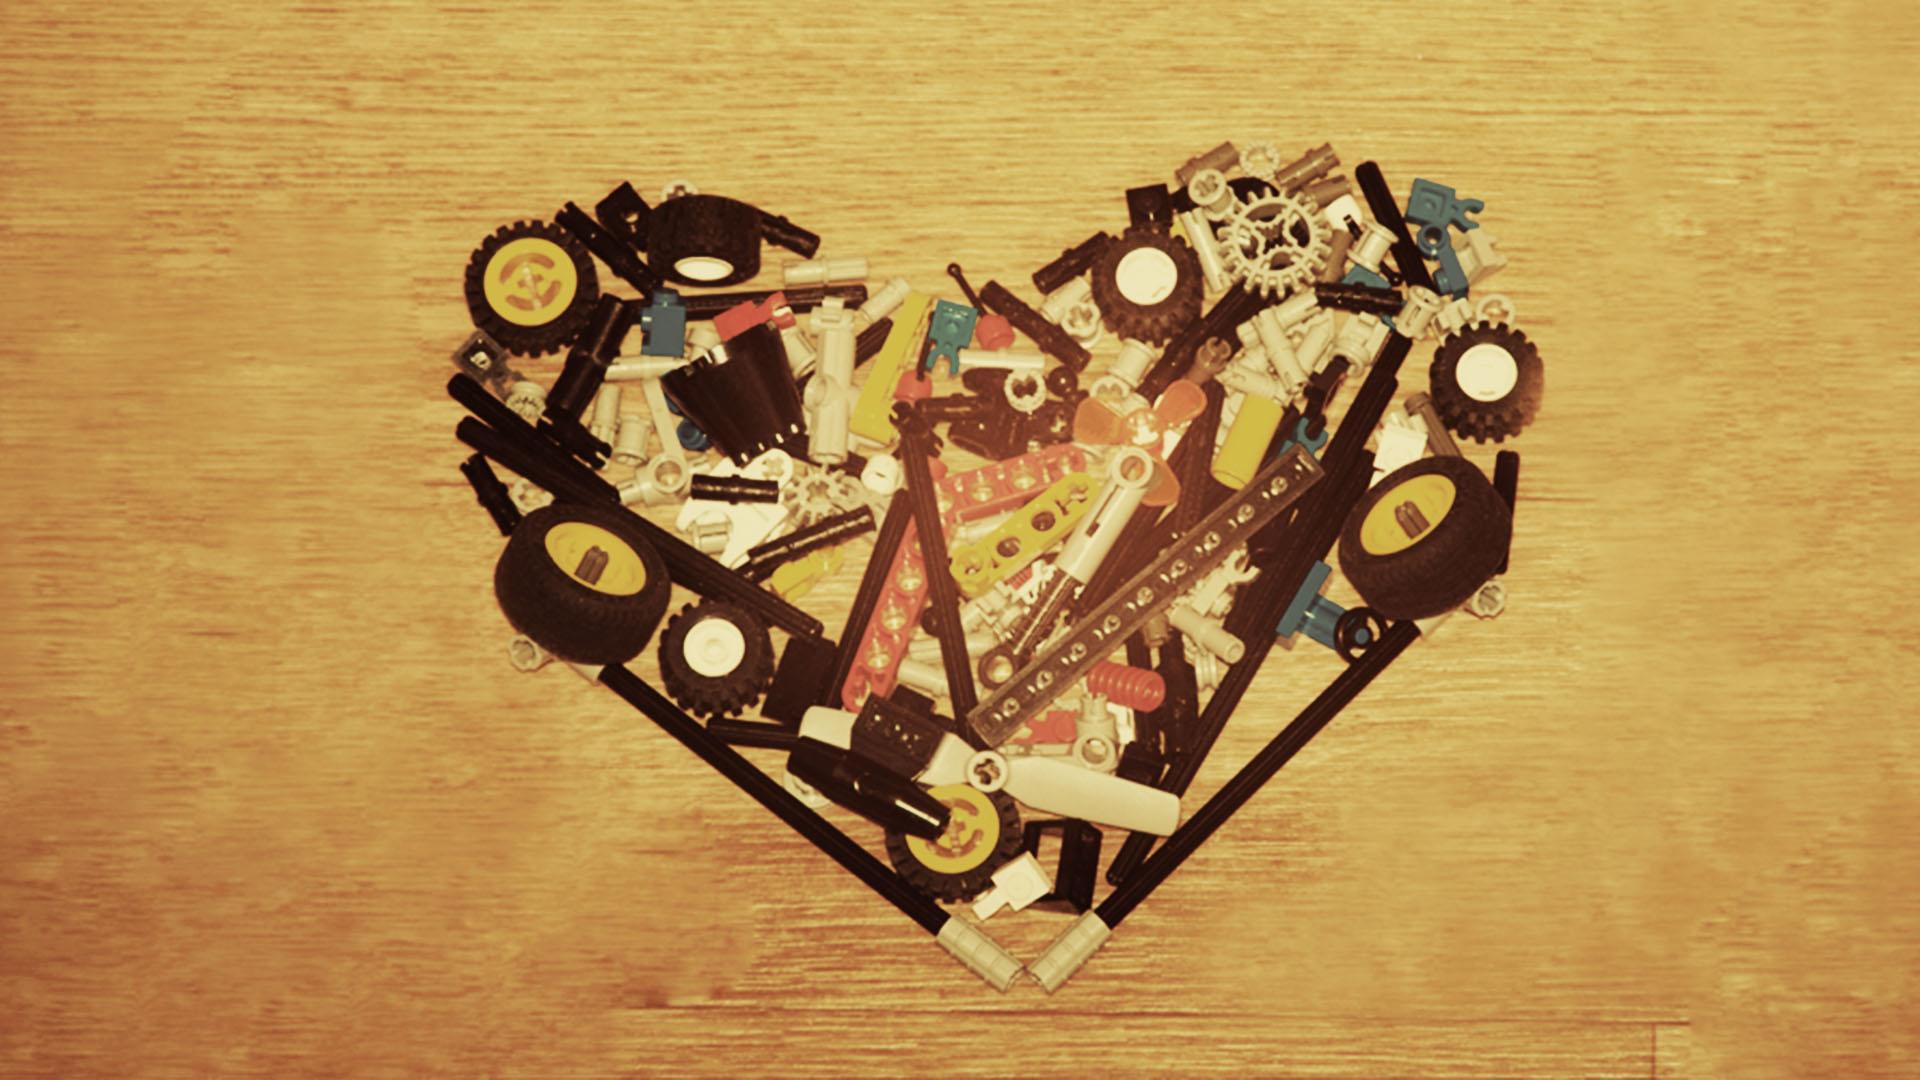 Steam Card Exchange Showcase Retention Flipper Owl Hearty Orange 1 Of 5artwork Heart